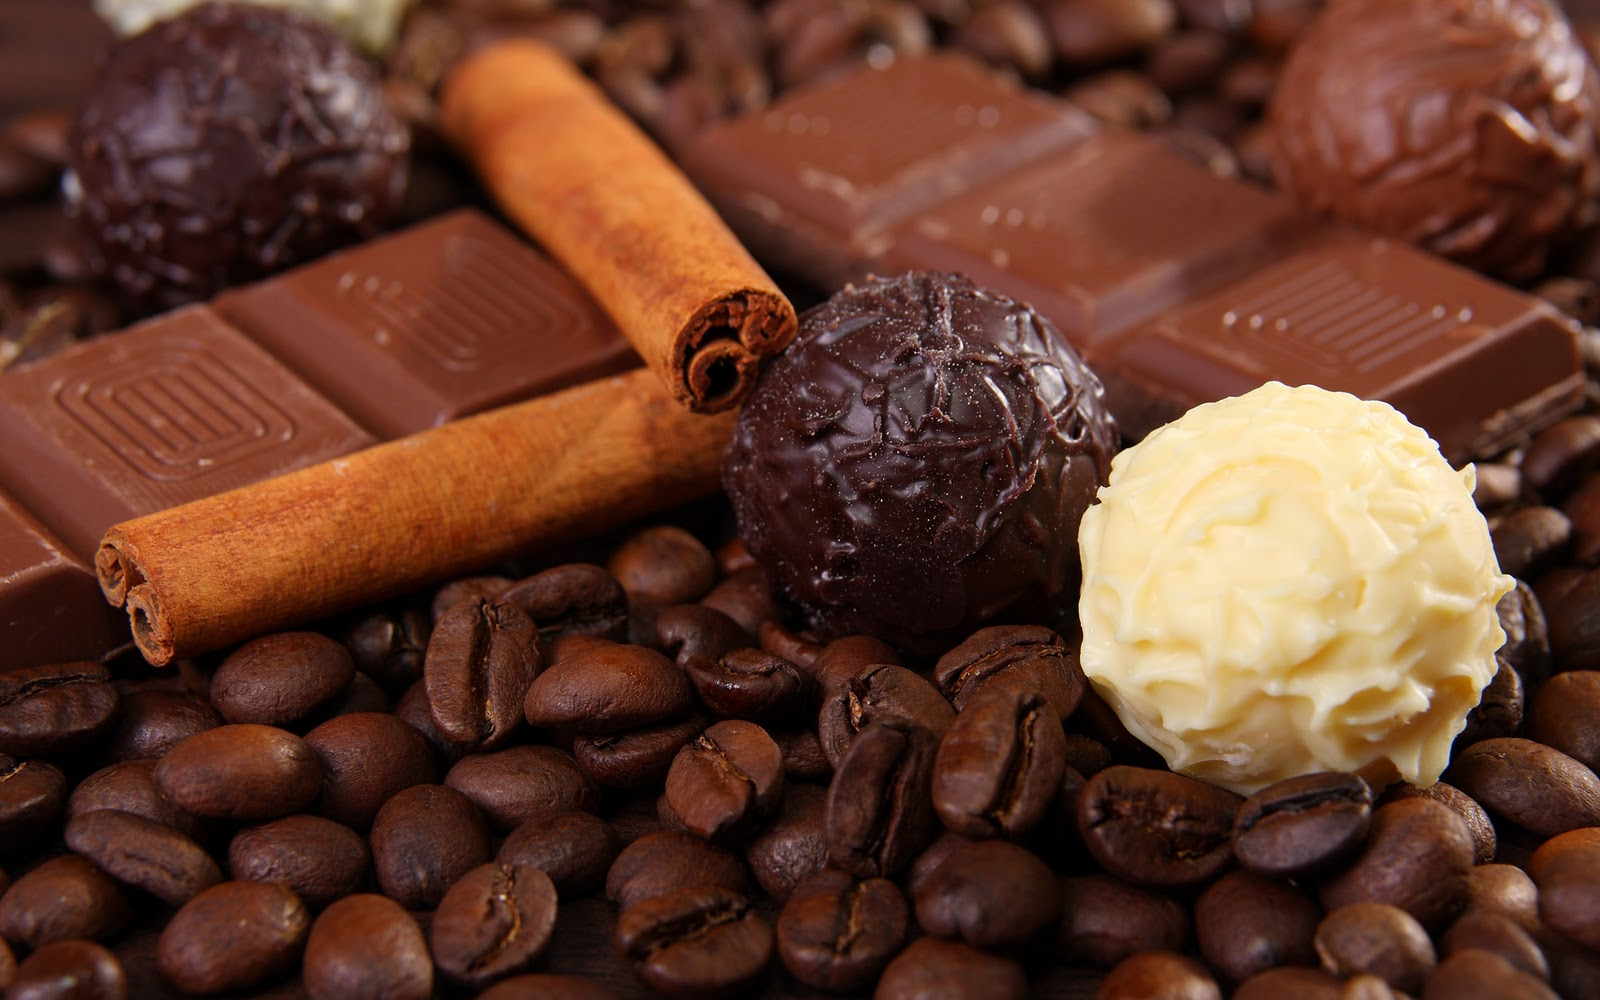 http://1.bp.blogspot.com/-Mb5EQ2eJ4Fo/To7BPjA6gcI/AAAAAAAANxk/bVWbQ6vdK4o/s1600/Lekkere-chocolade-achtergronden-hd-chocolade-wallpapers-afbeelding-foto-24.jpg